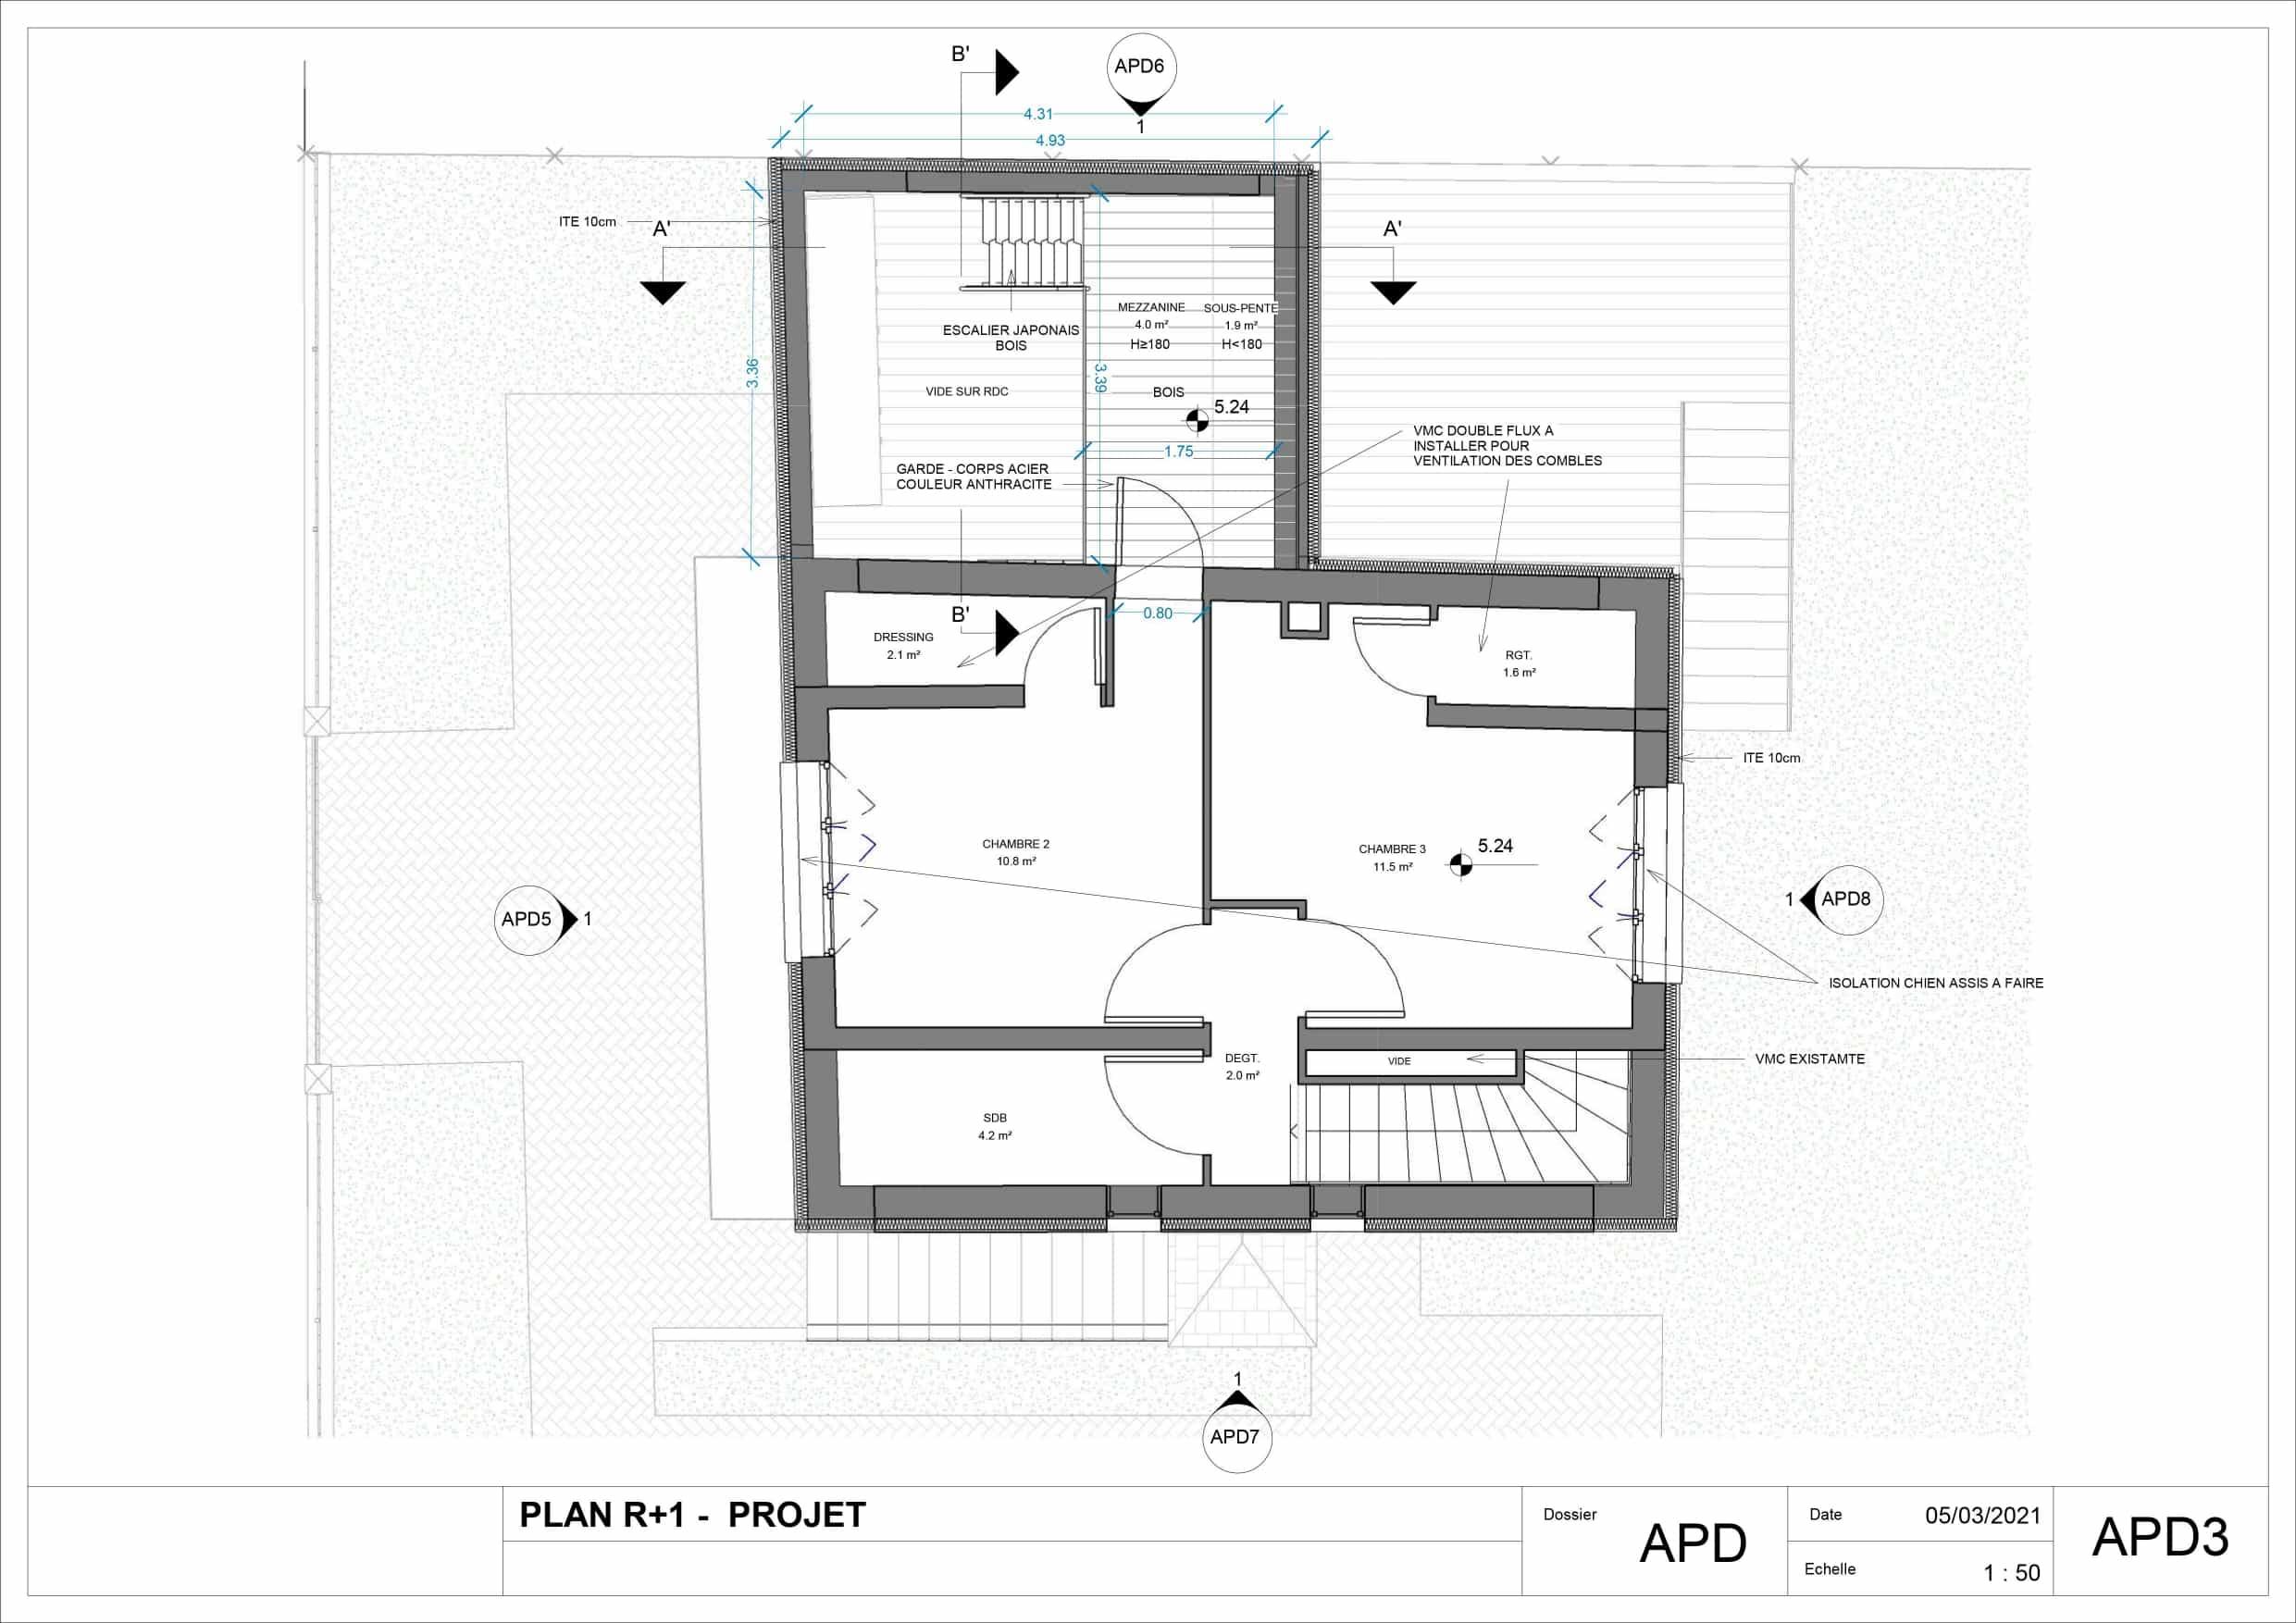 Plan de masse R+1